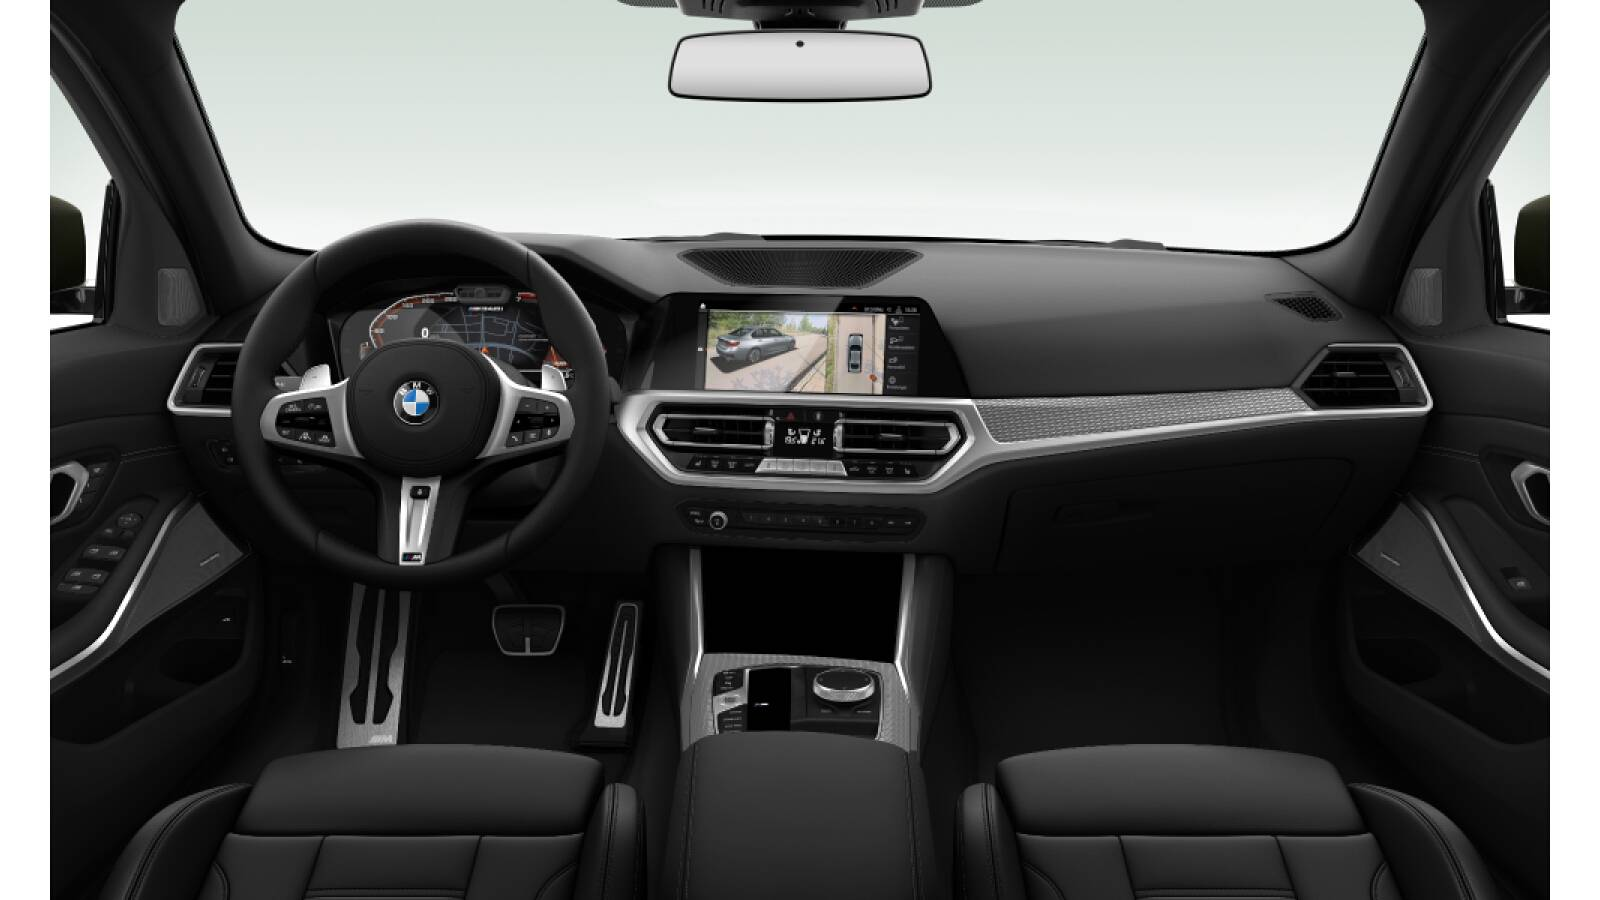 BMW 3 Series 2019 leaked photos (23)